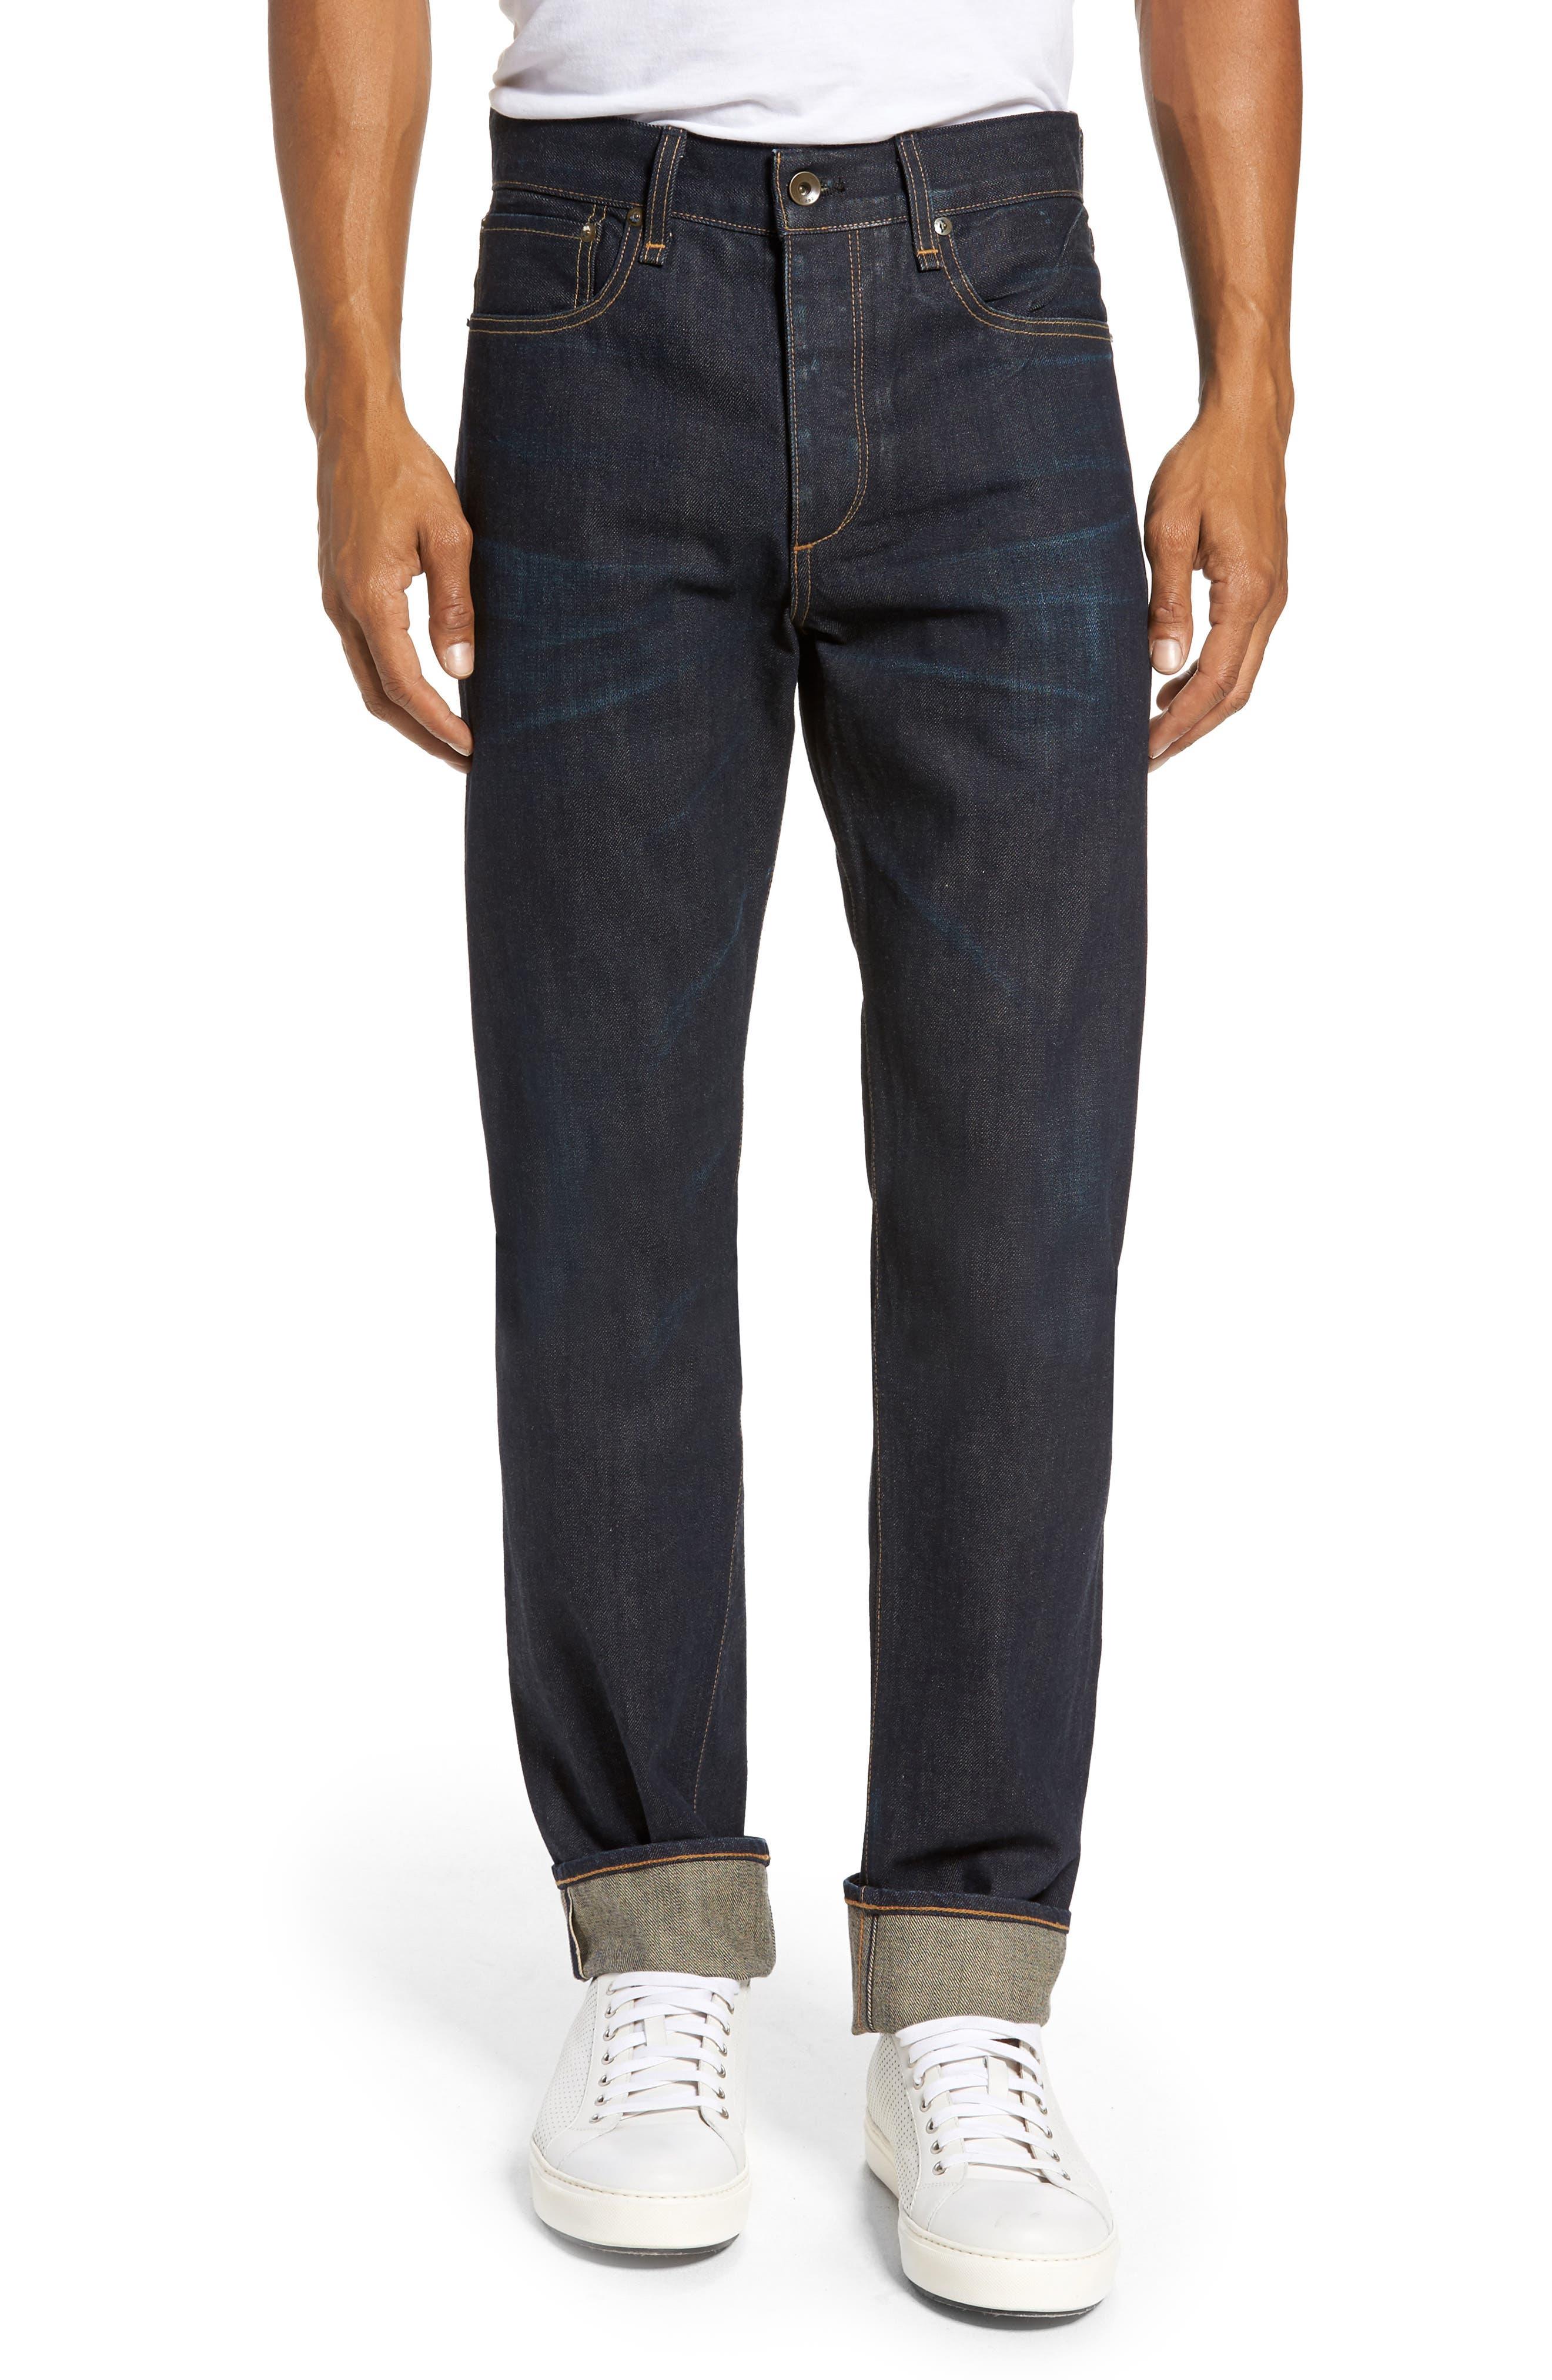 Main Image - rag & bone Fit 2 Slim Fit Jeans (Worn Olive Resin)